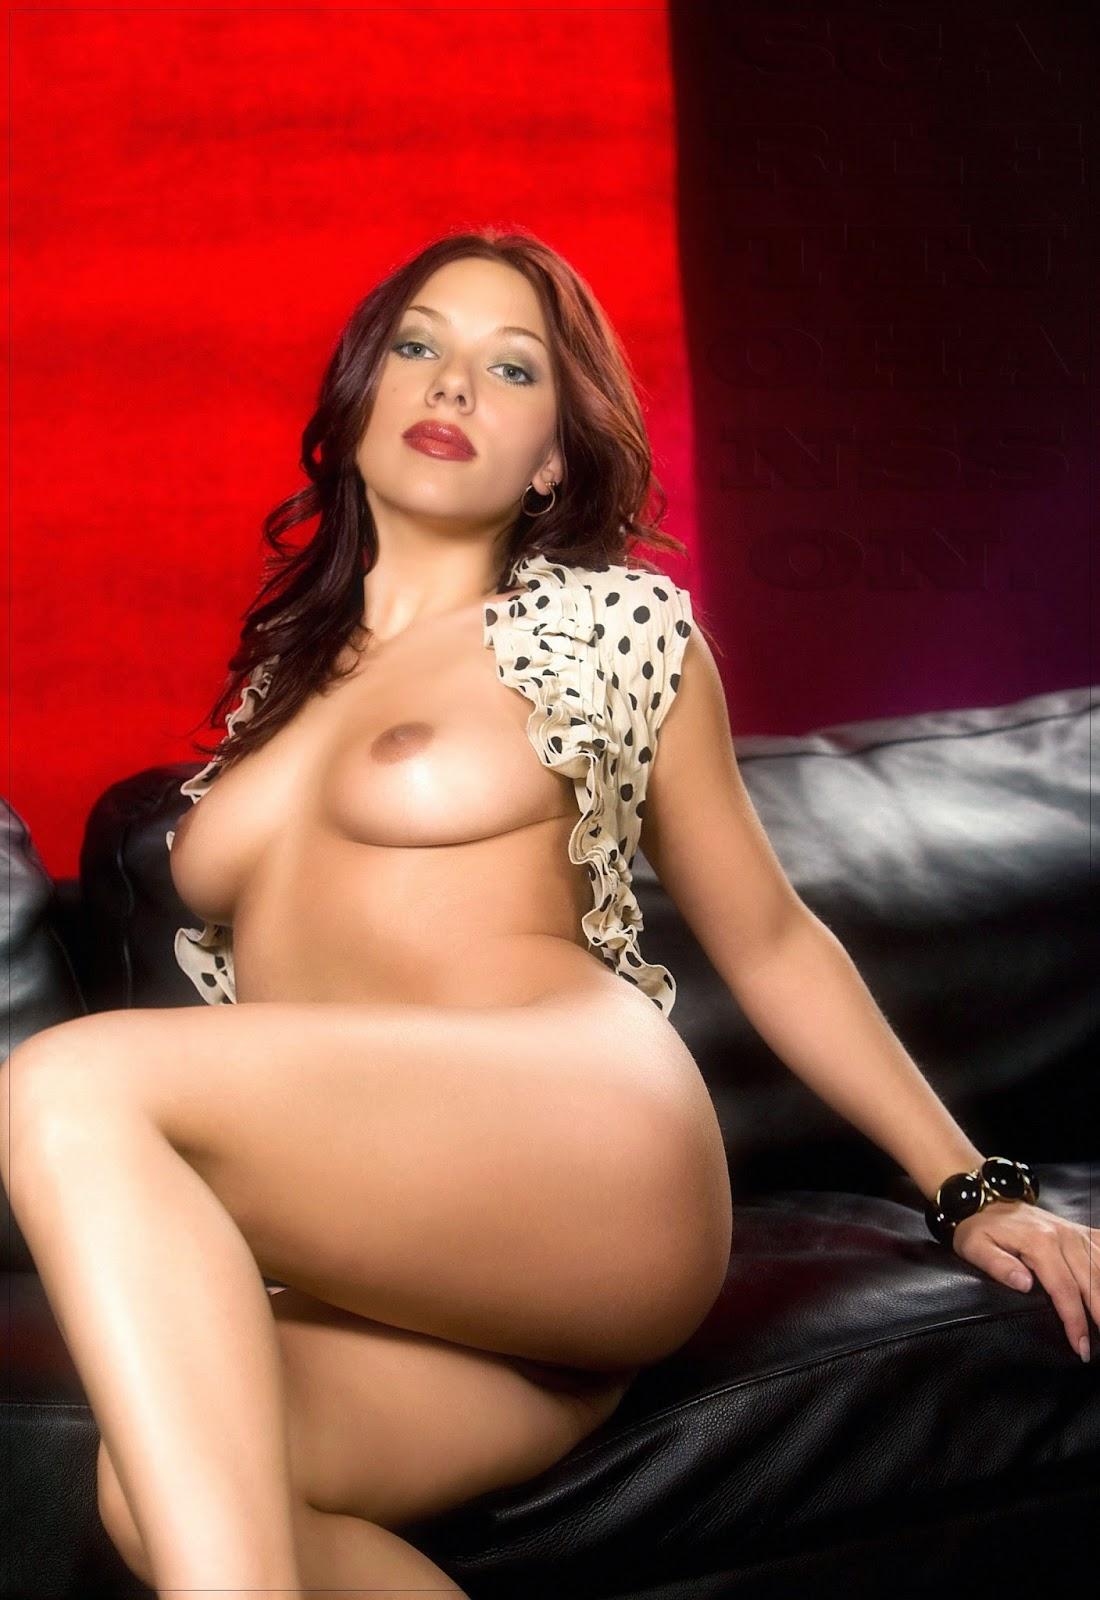 Nackt Bilder : Scarlett Johansson Nude Images   nackter arsch.com